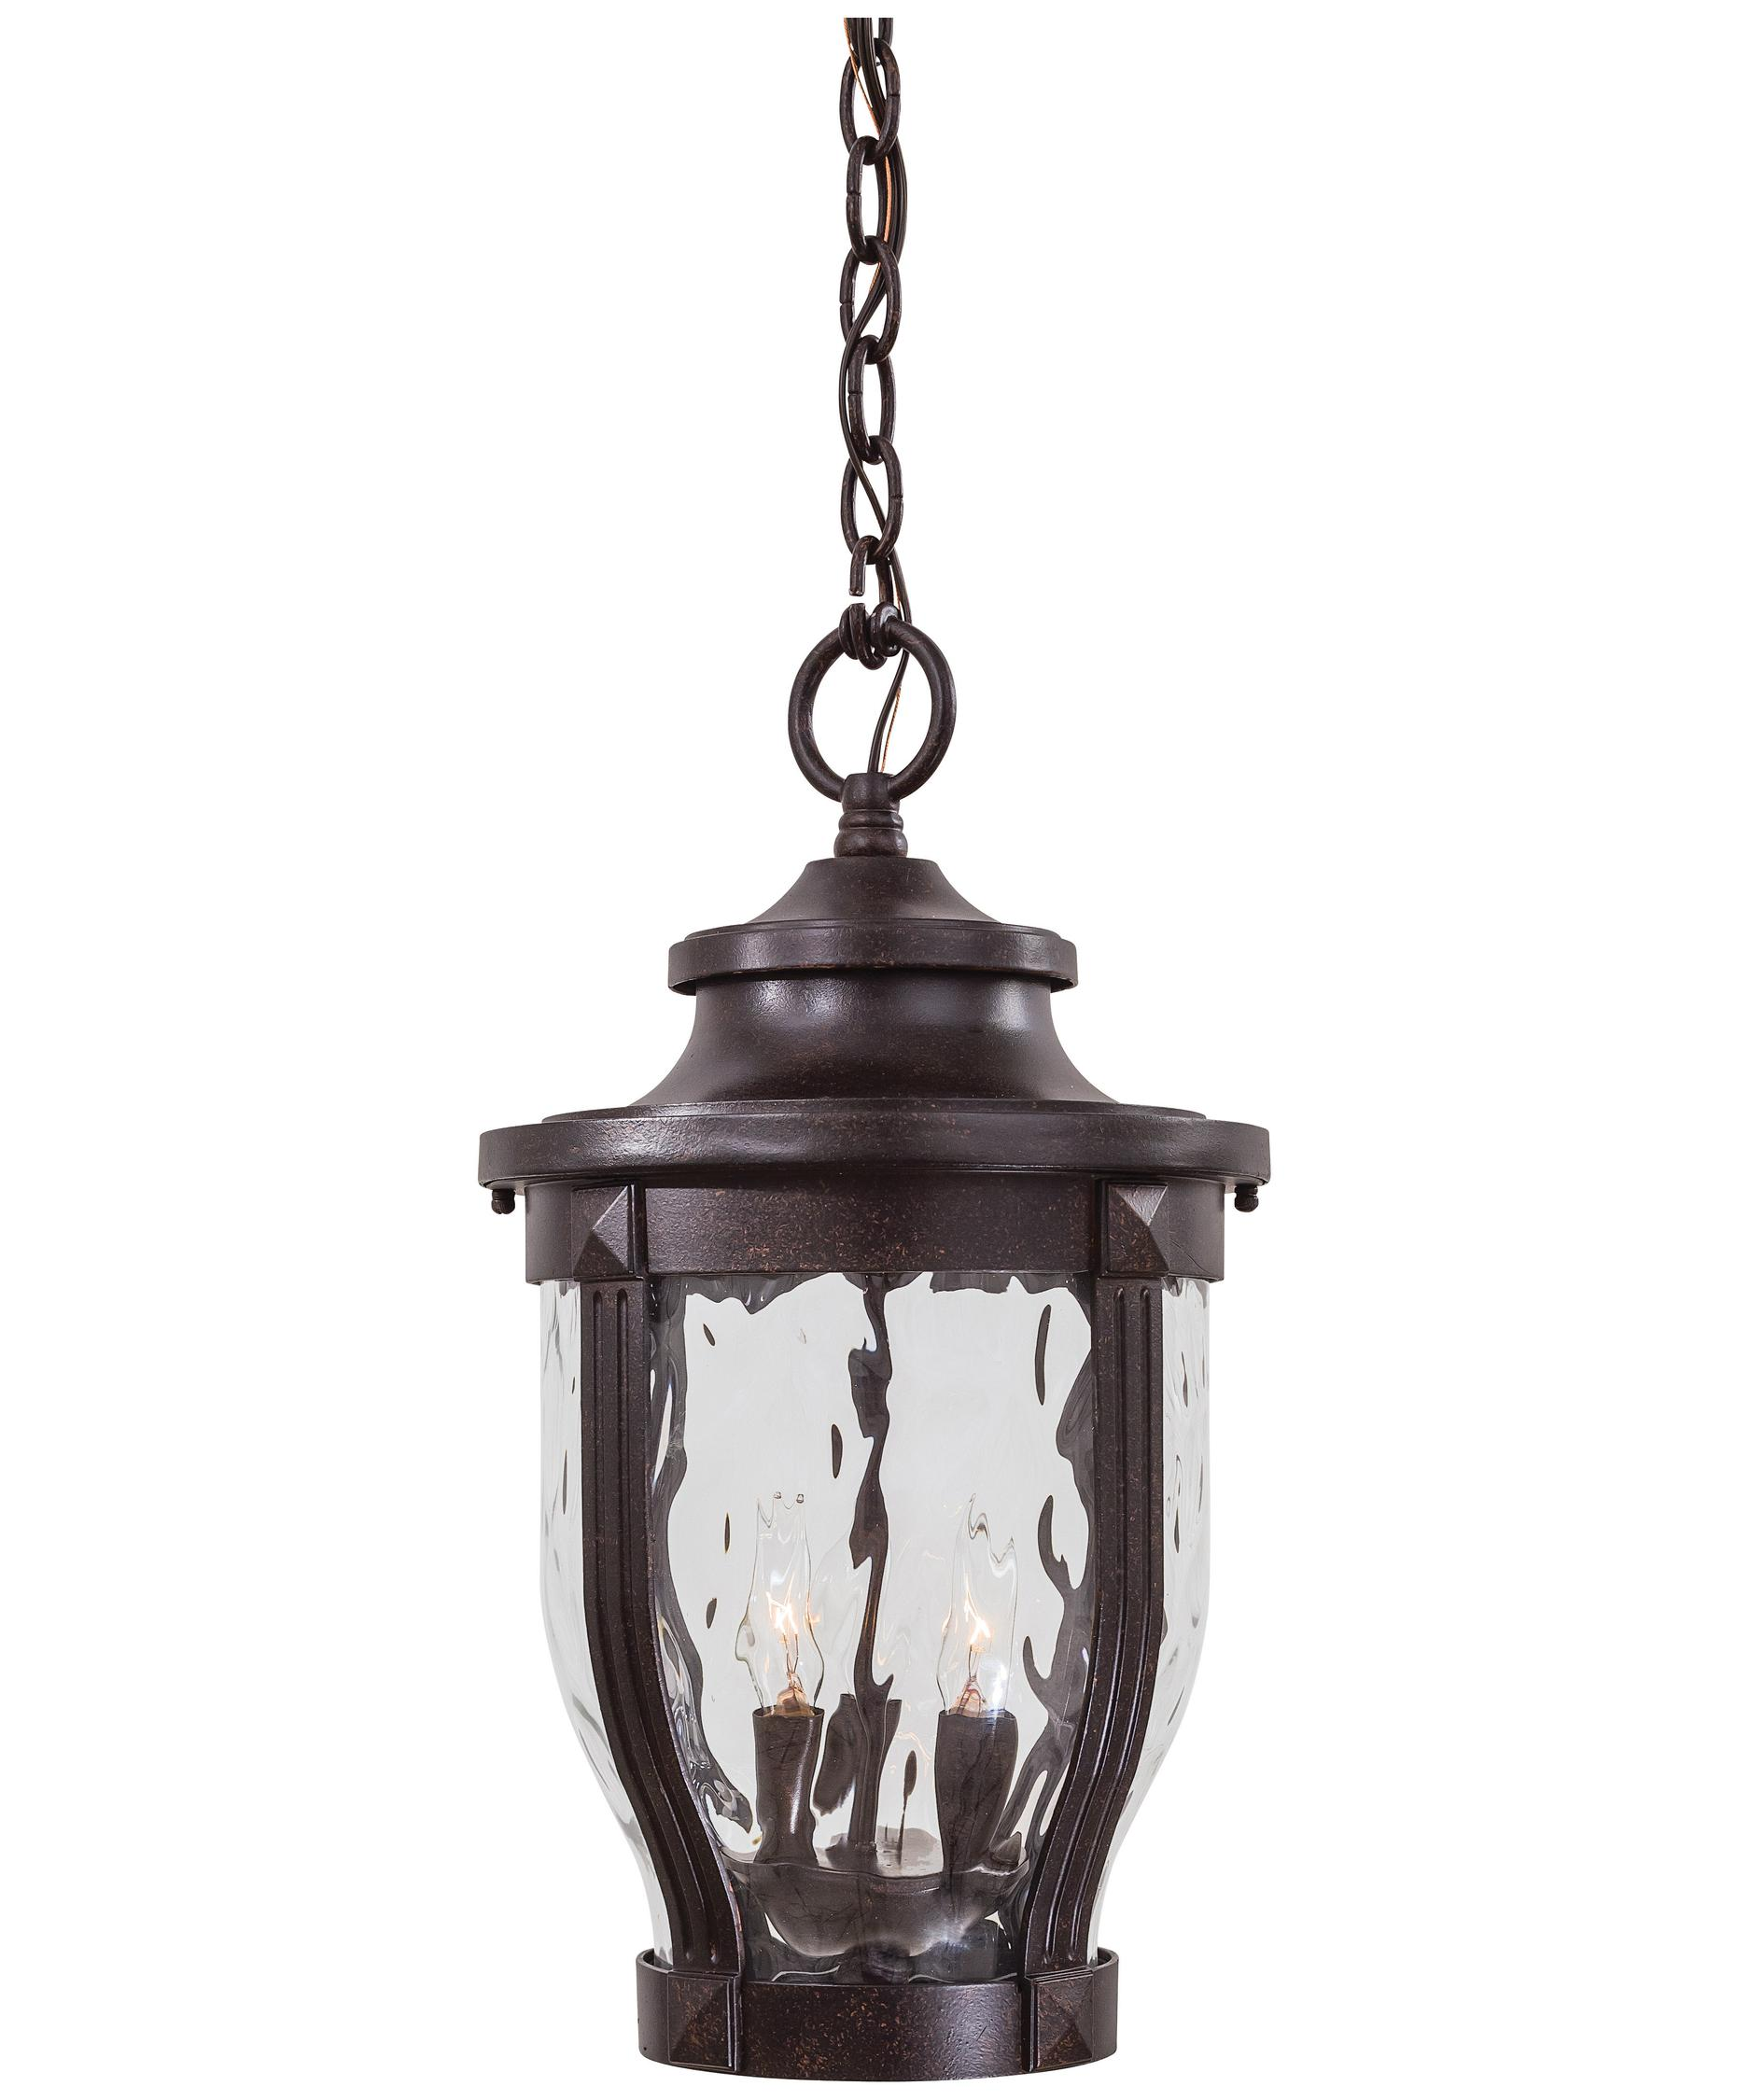 Outdoor hanging lamp - Minka Lavery 8764 Merrimack 10 Inch Wide 3 Light Outdoor Hanging Lantern Capitol Lighting 1 800lighting Com